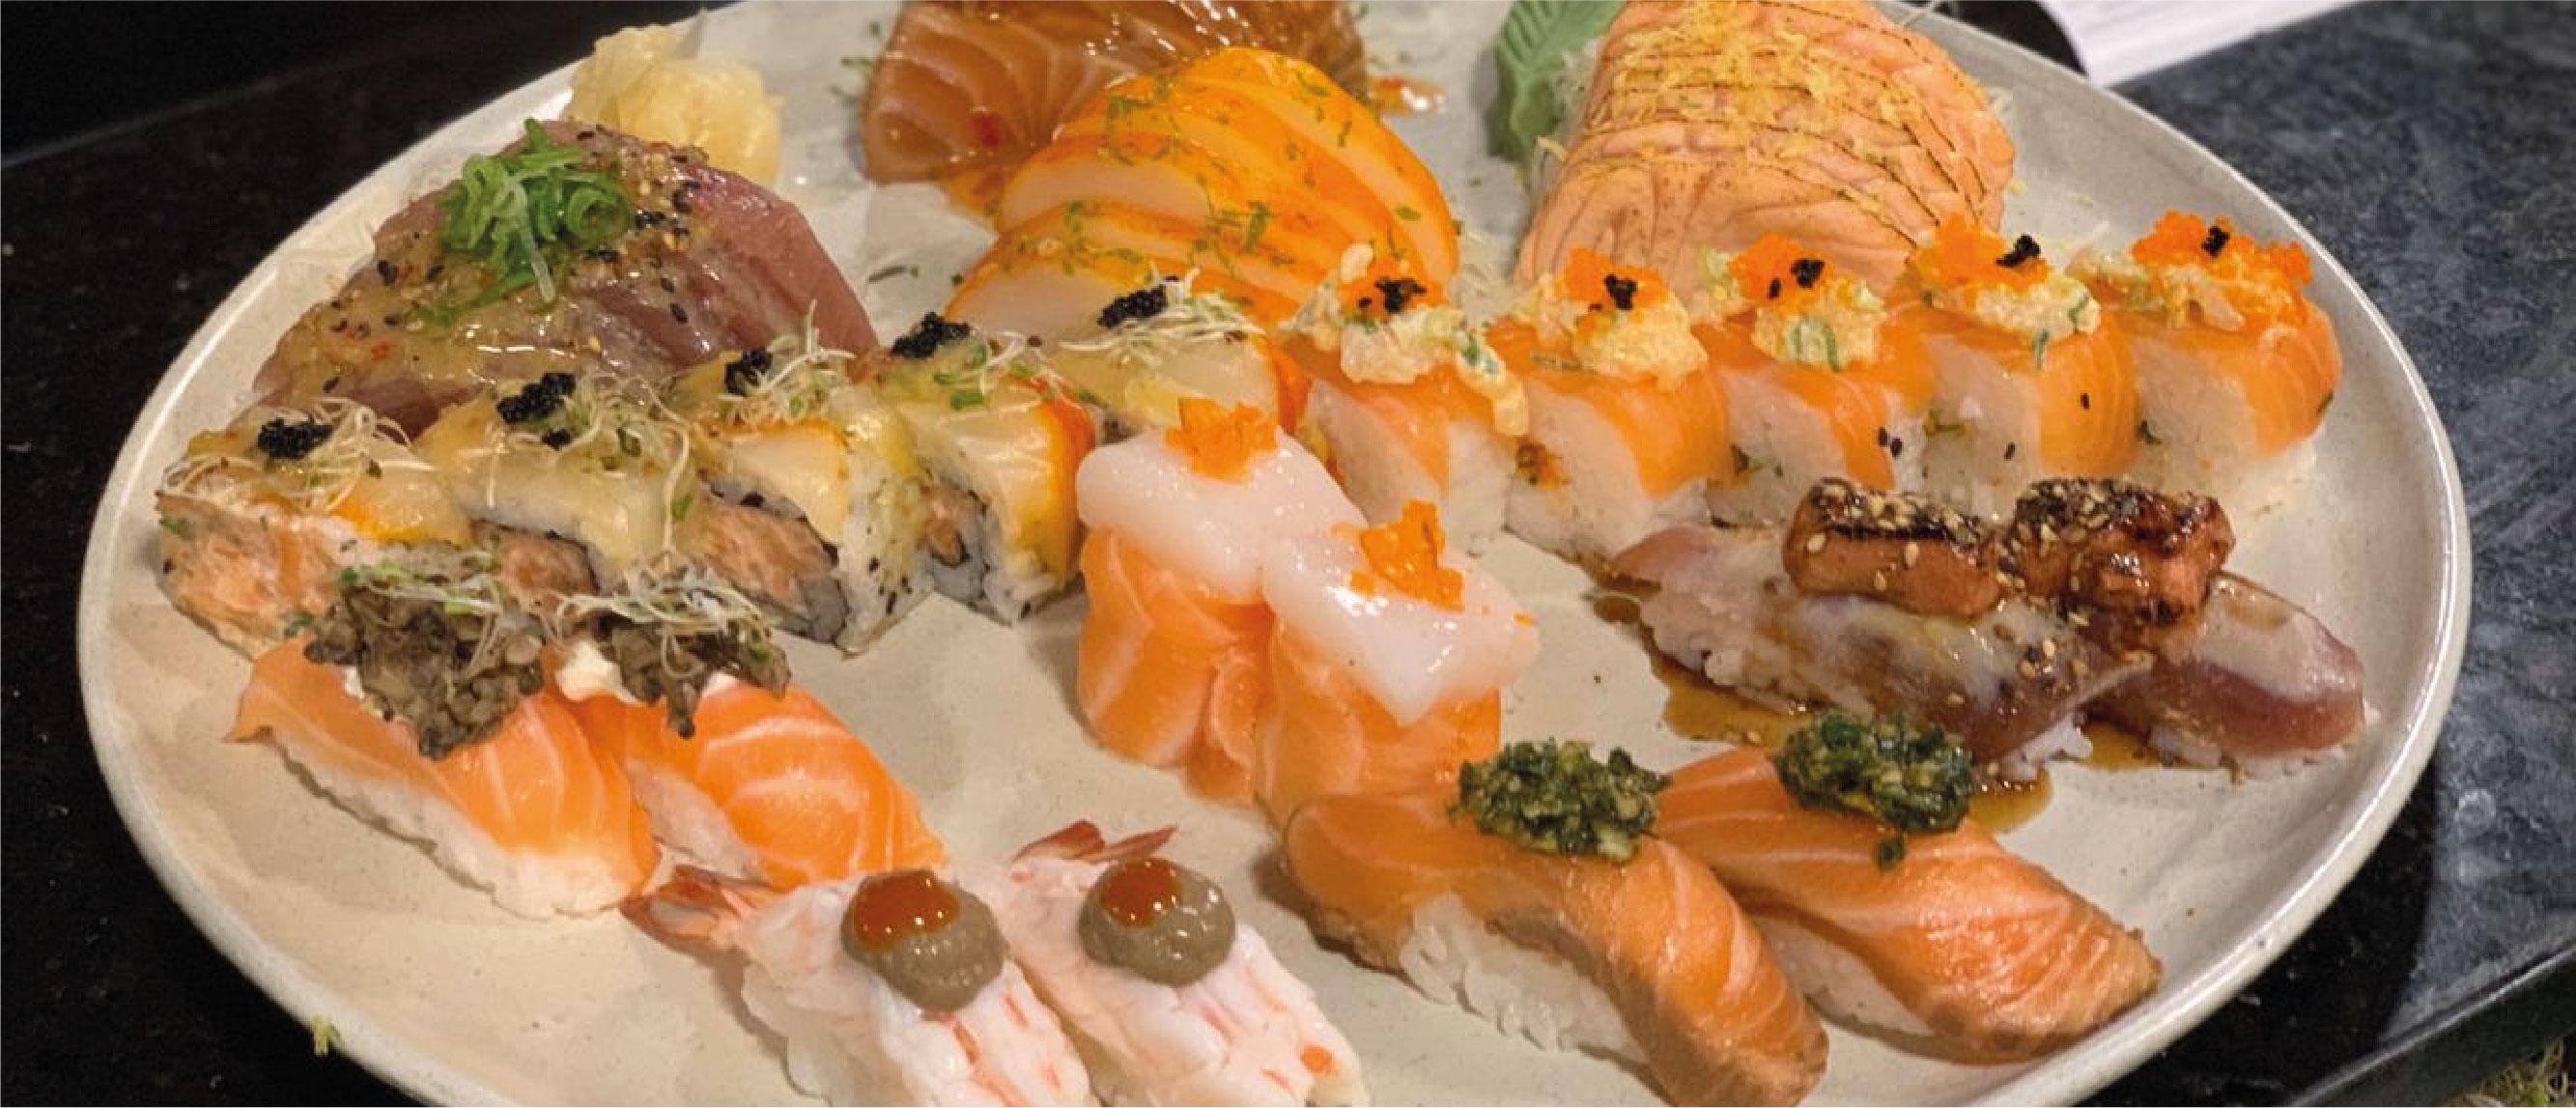 fotos-rj-sushijapa-02